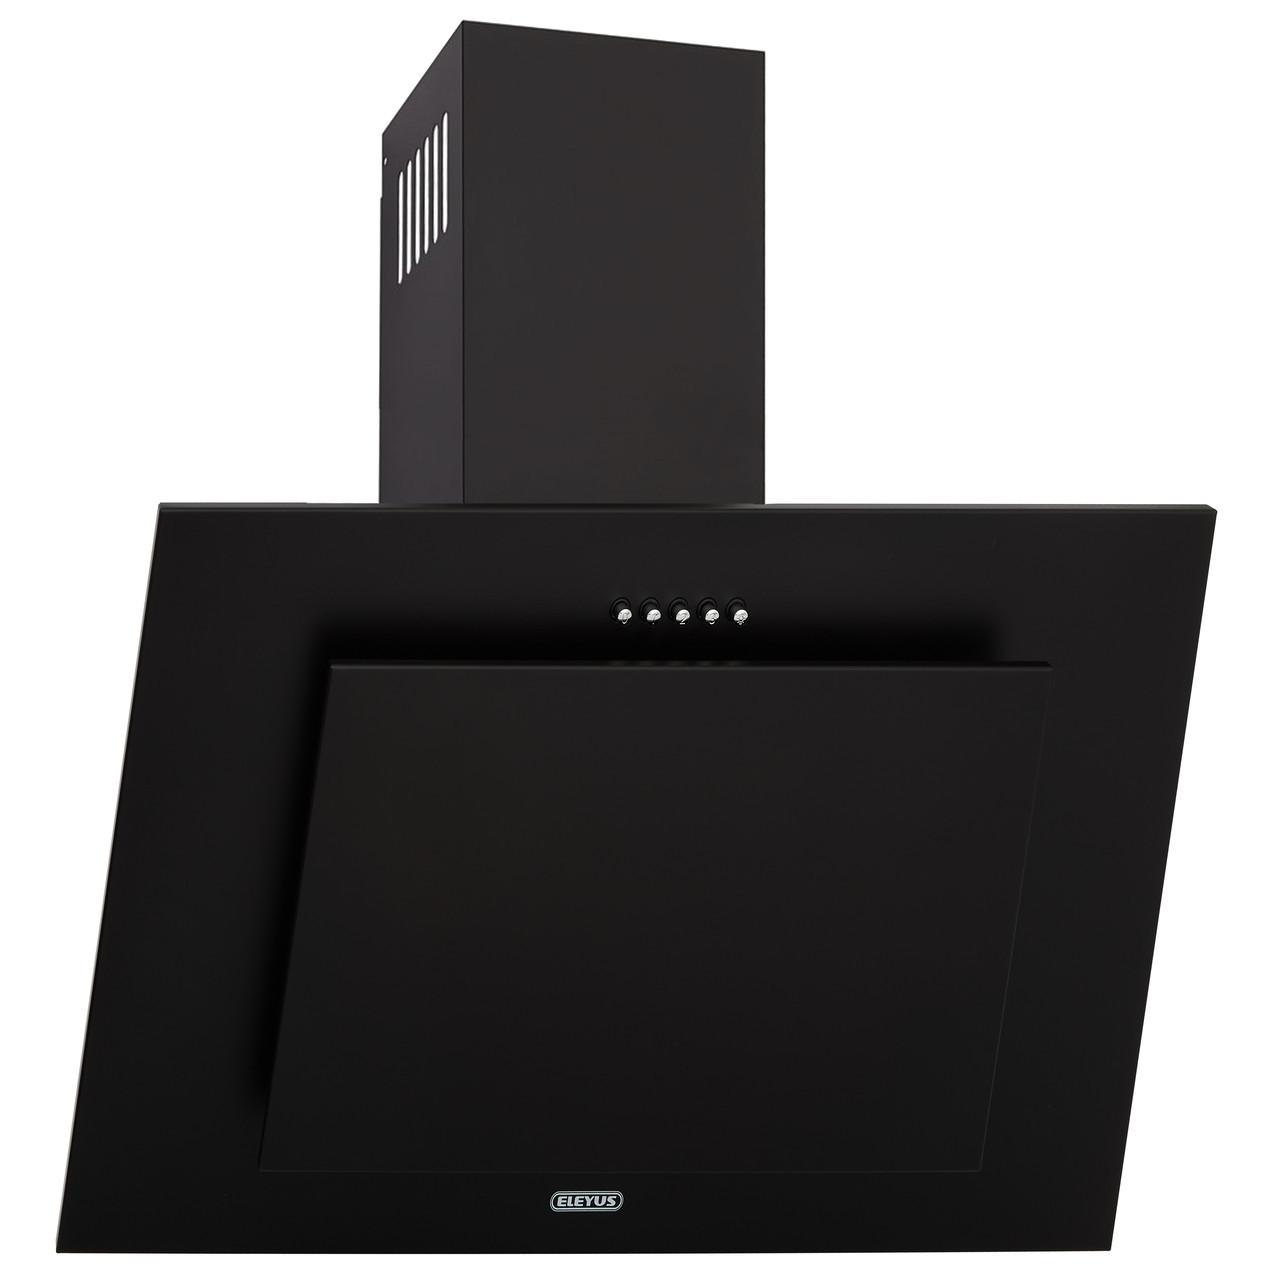 Витяжка кухонна вертикальна ELEYUS Vertical 1000 50 BL + Безкоштовна доставка!